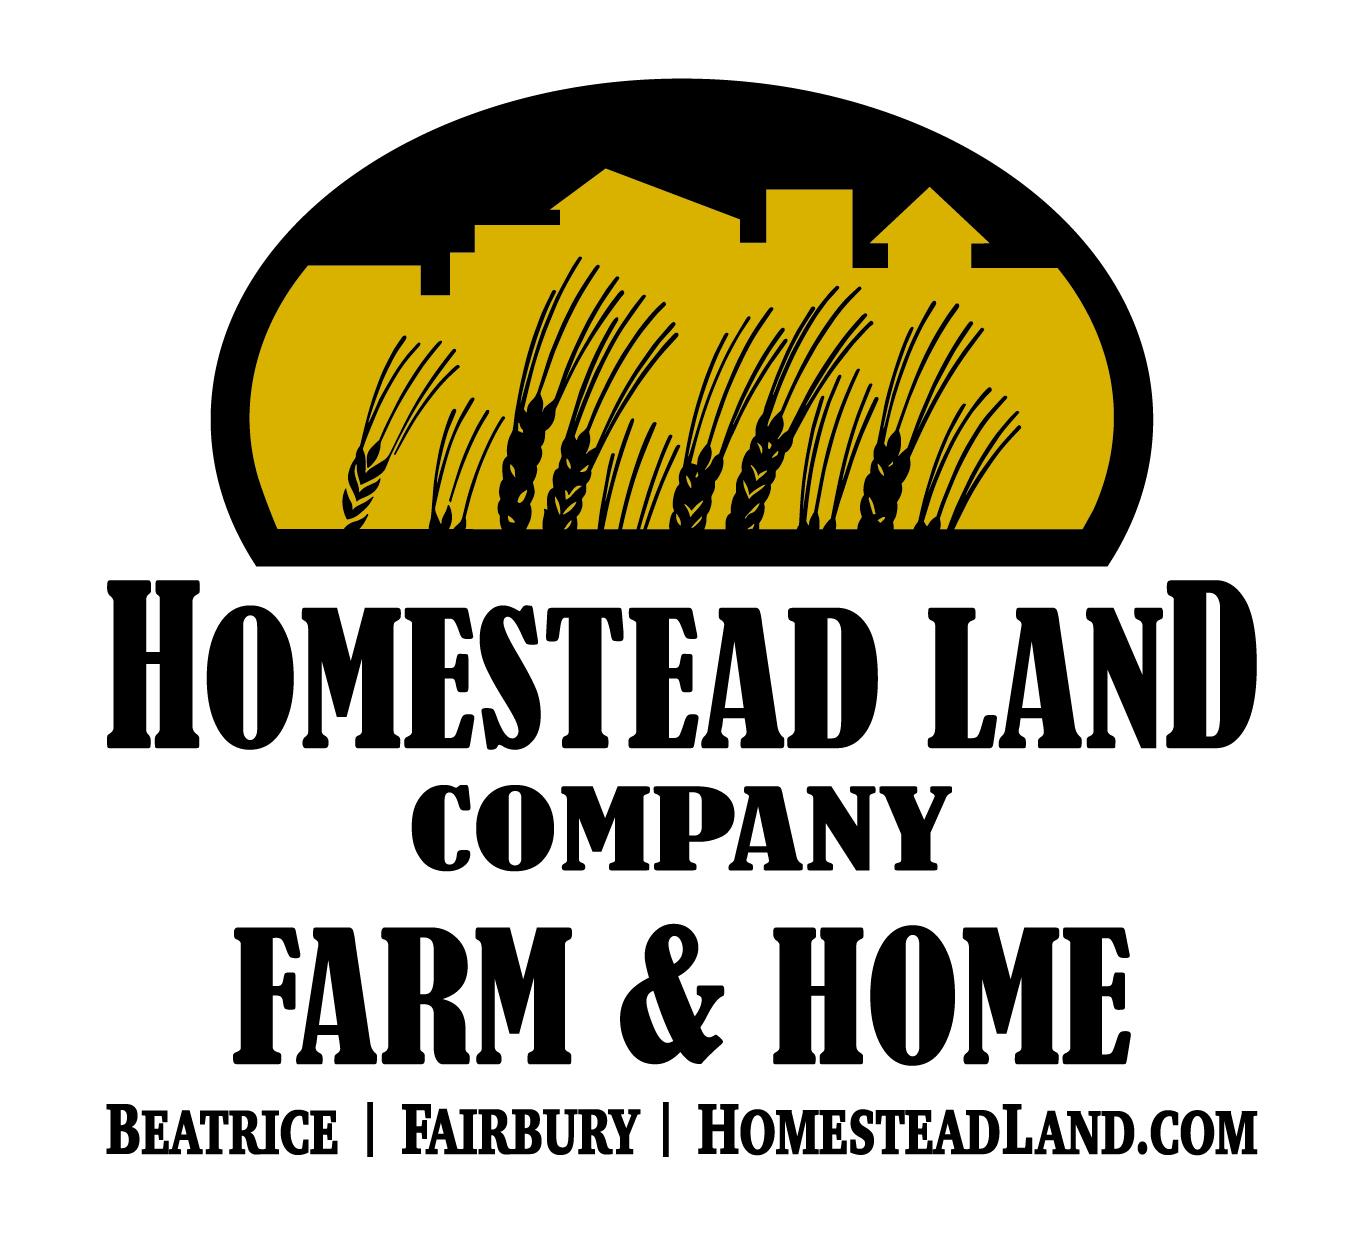 Homestead Land Company